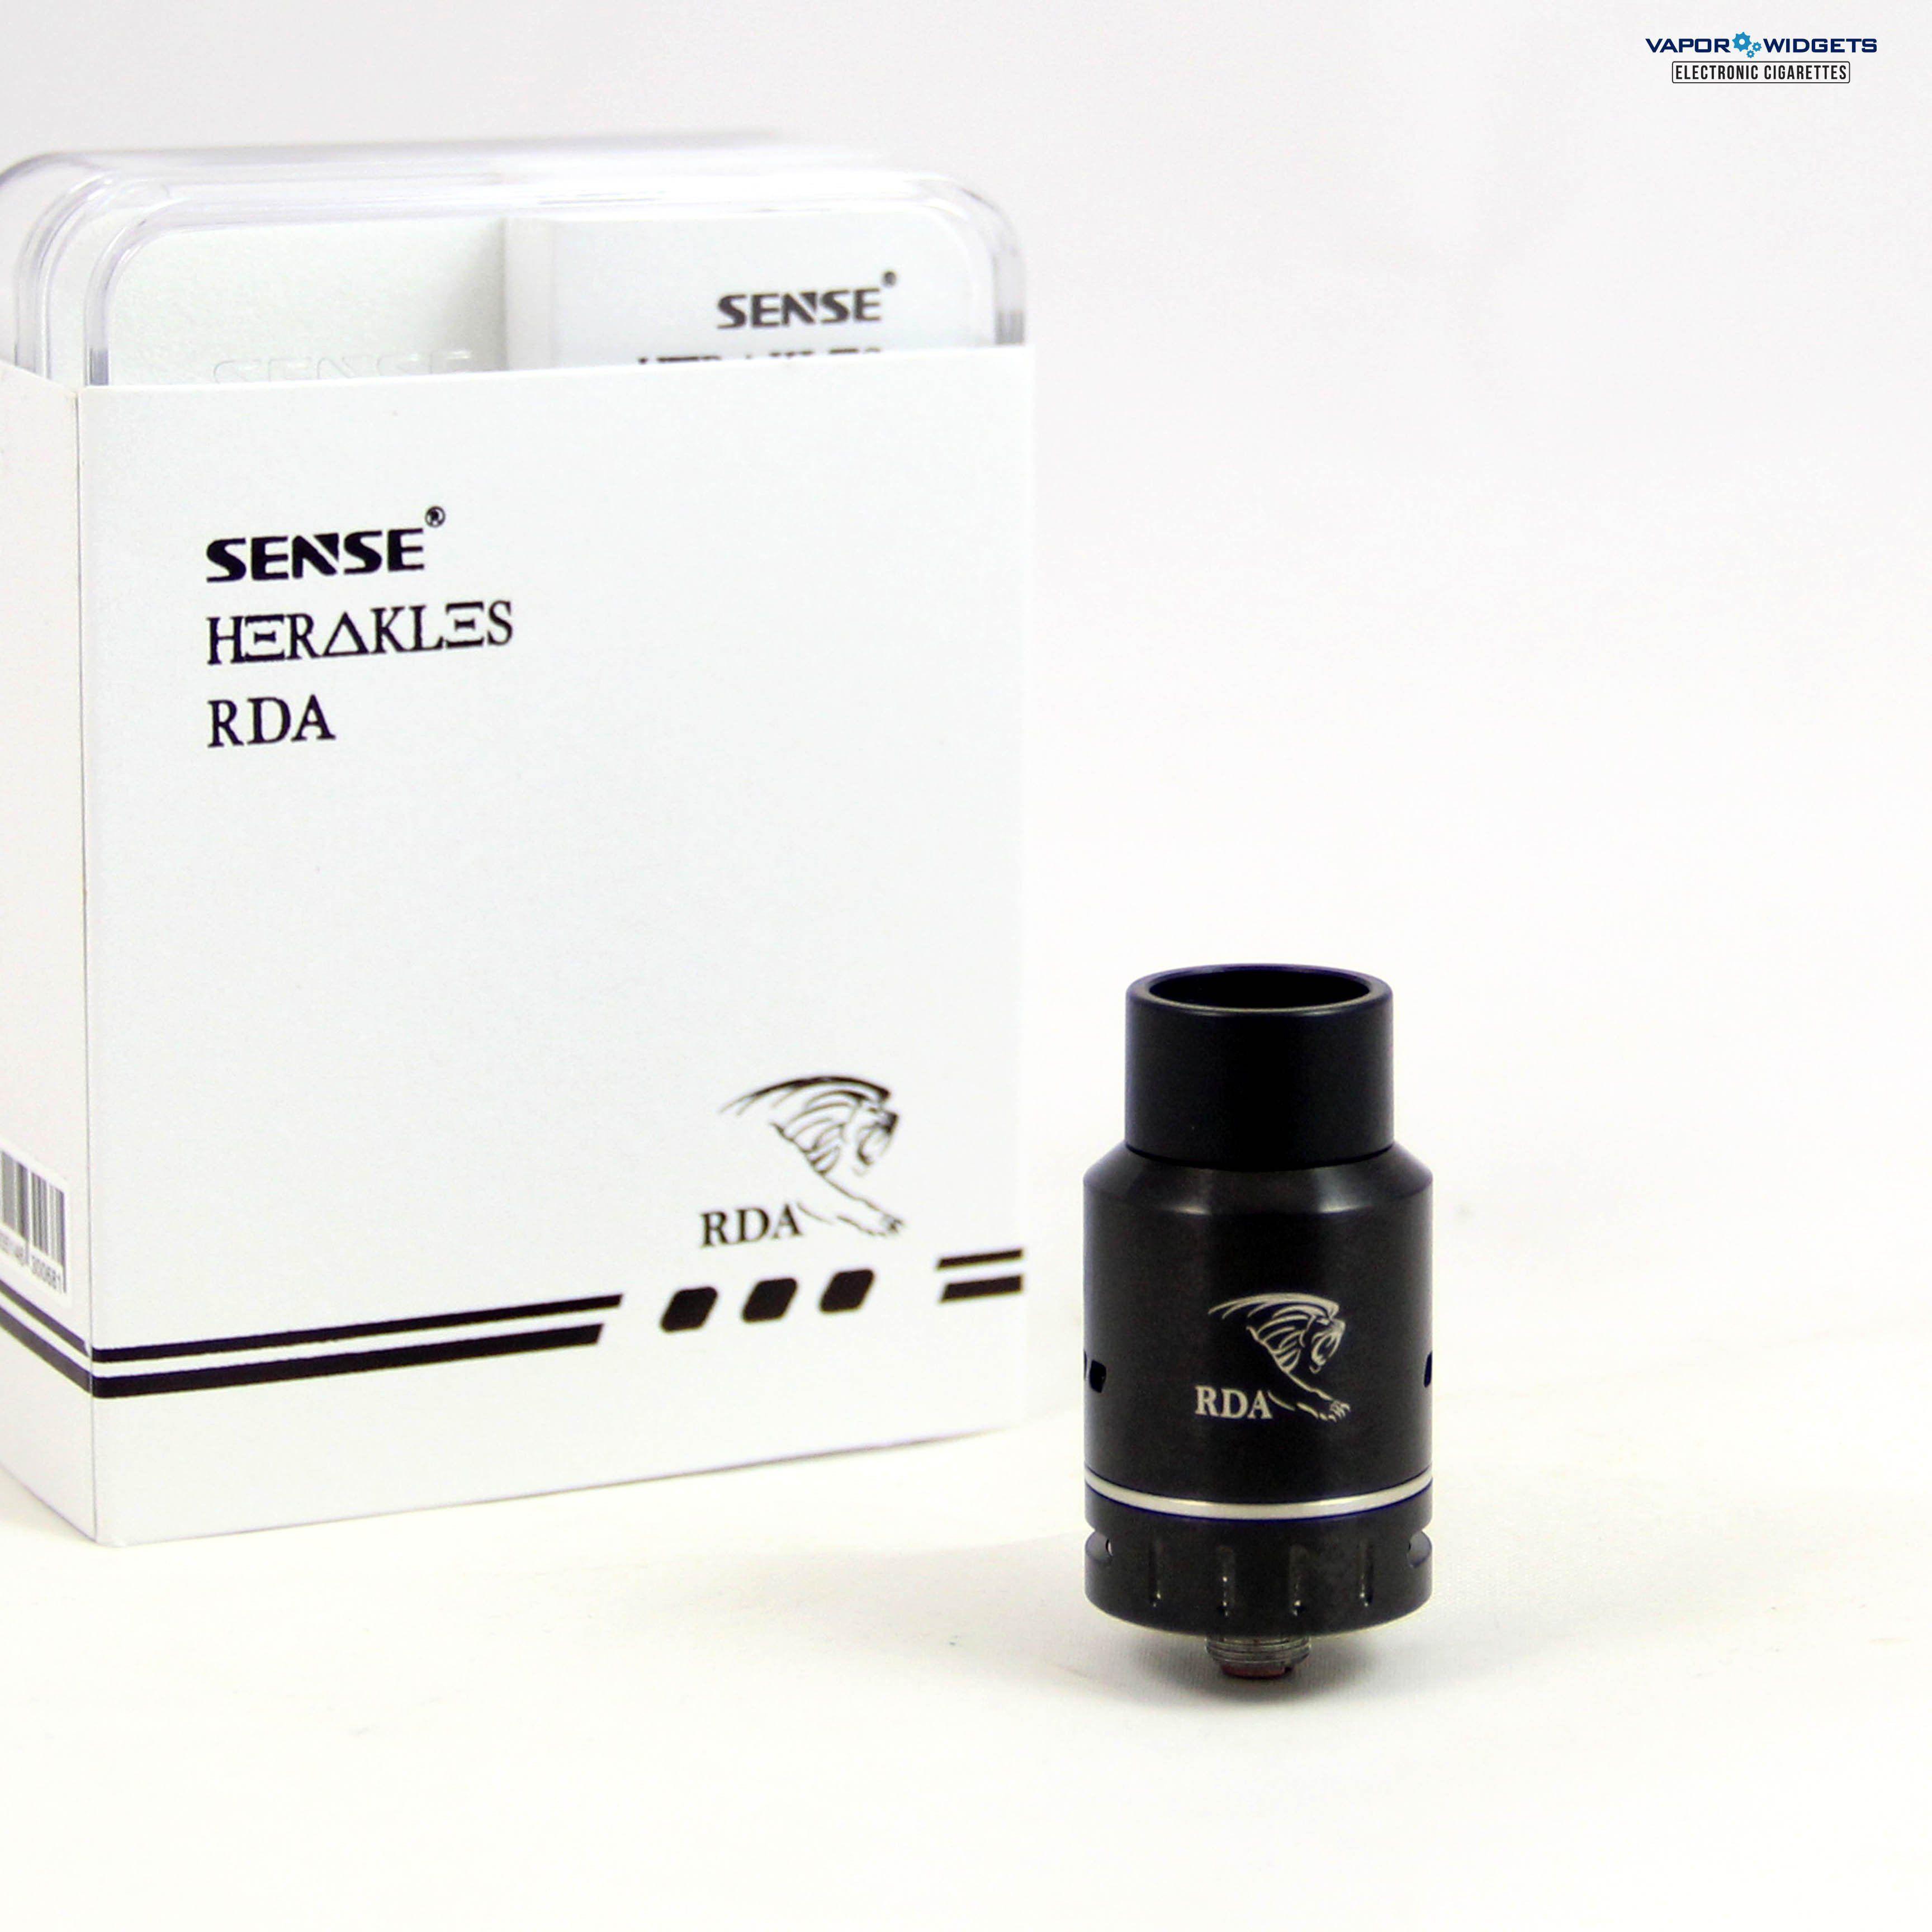 Herakles Rda 22mm By Sense Vapor Widgets Miami Fl 33186 Tank Vape Tsunami 22 Mm